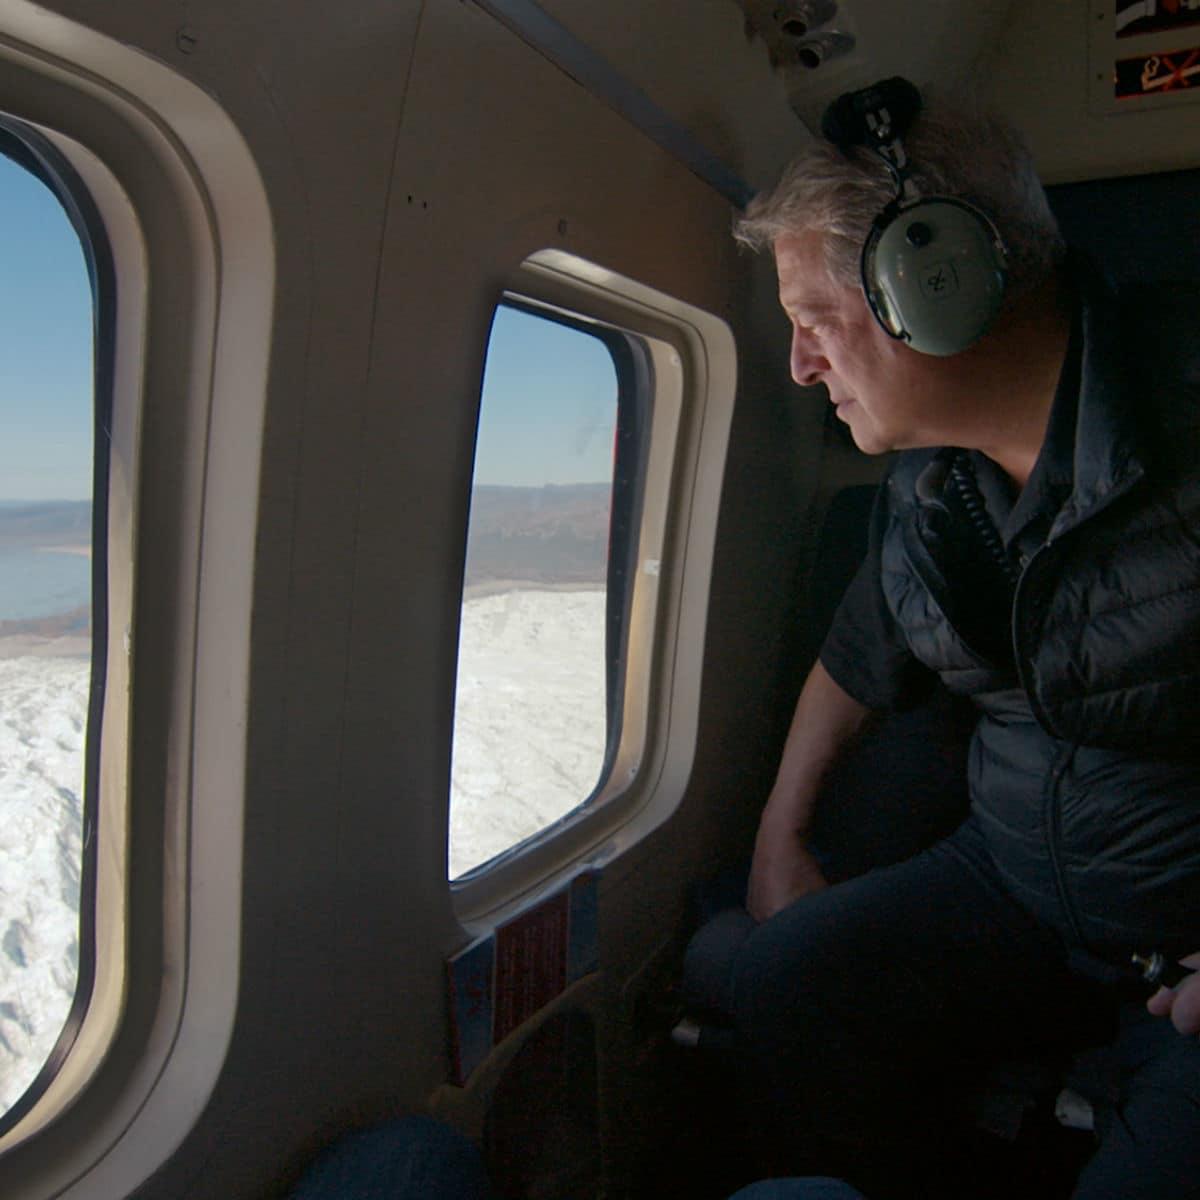 Al Gore in An Inconvenient Sequel: Truth to Power